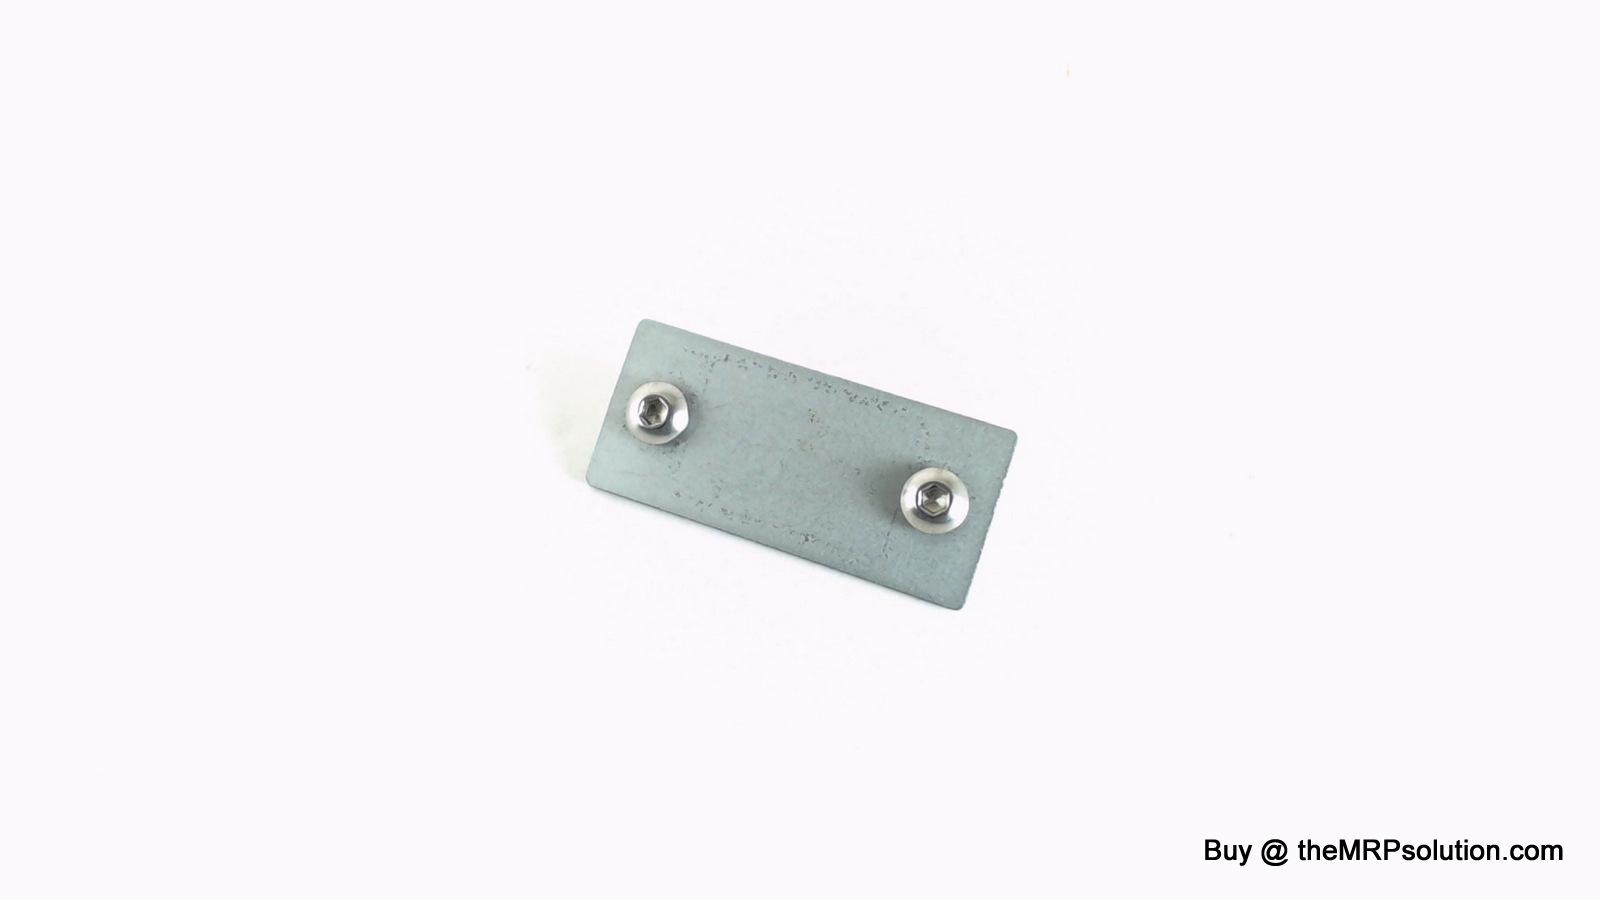 PRINTRONIX 177857-001 PLATE, BLANK, SMALL Refurbished